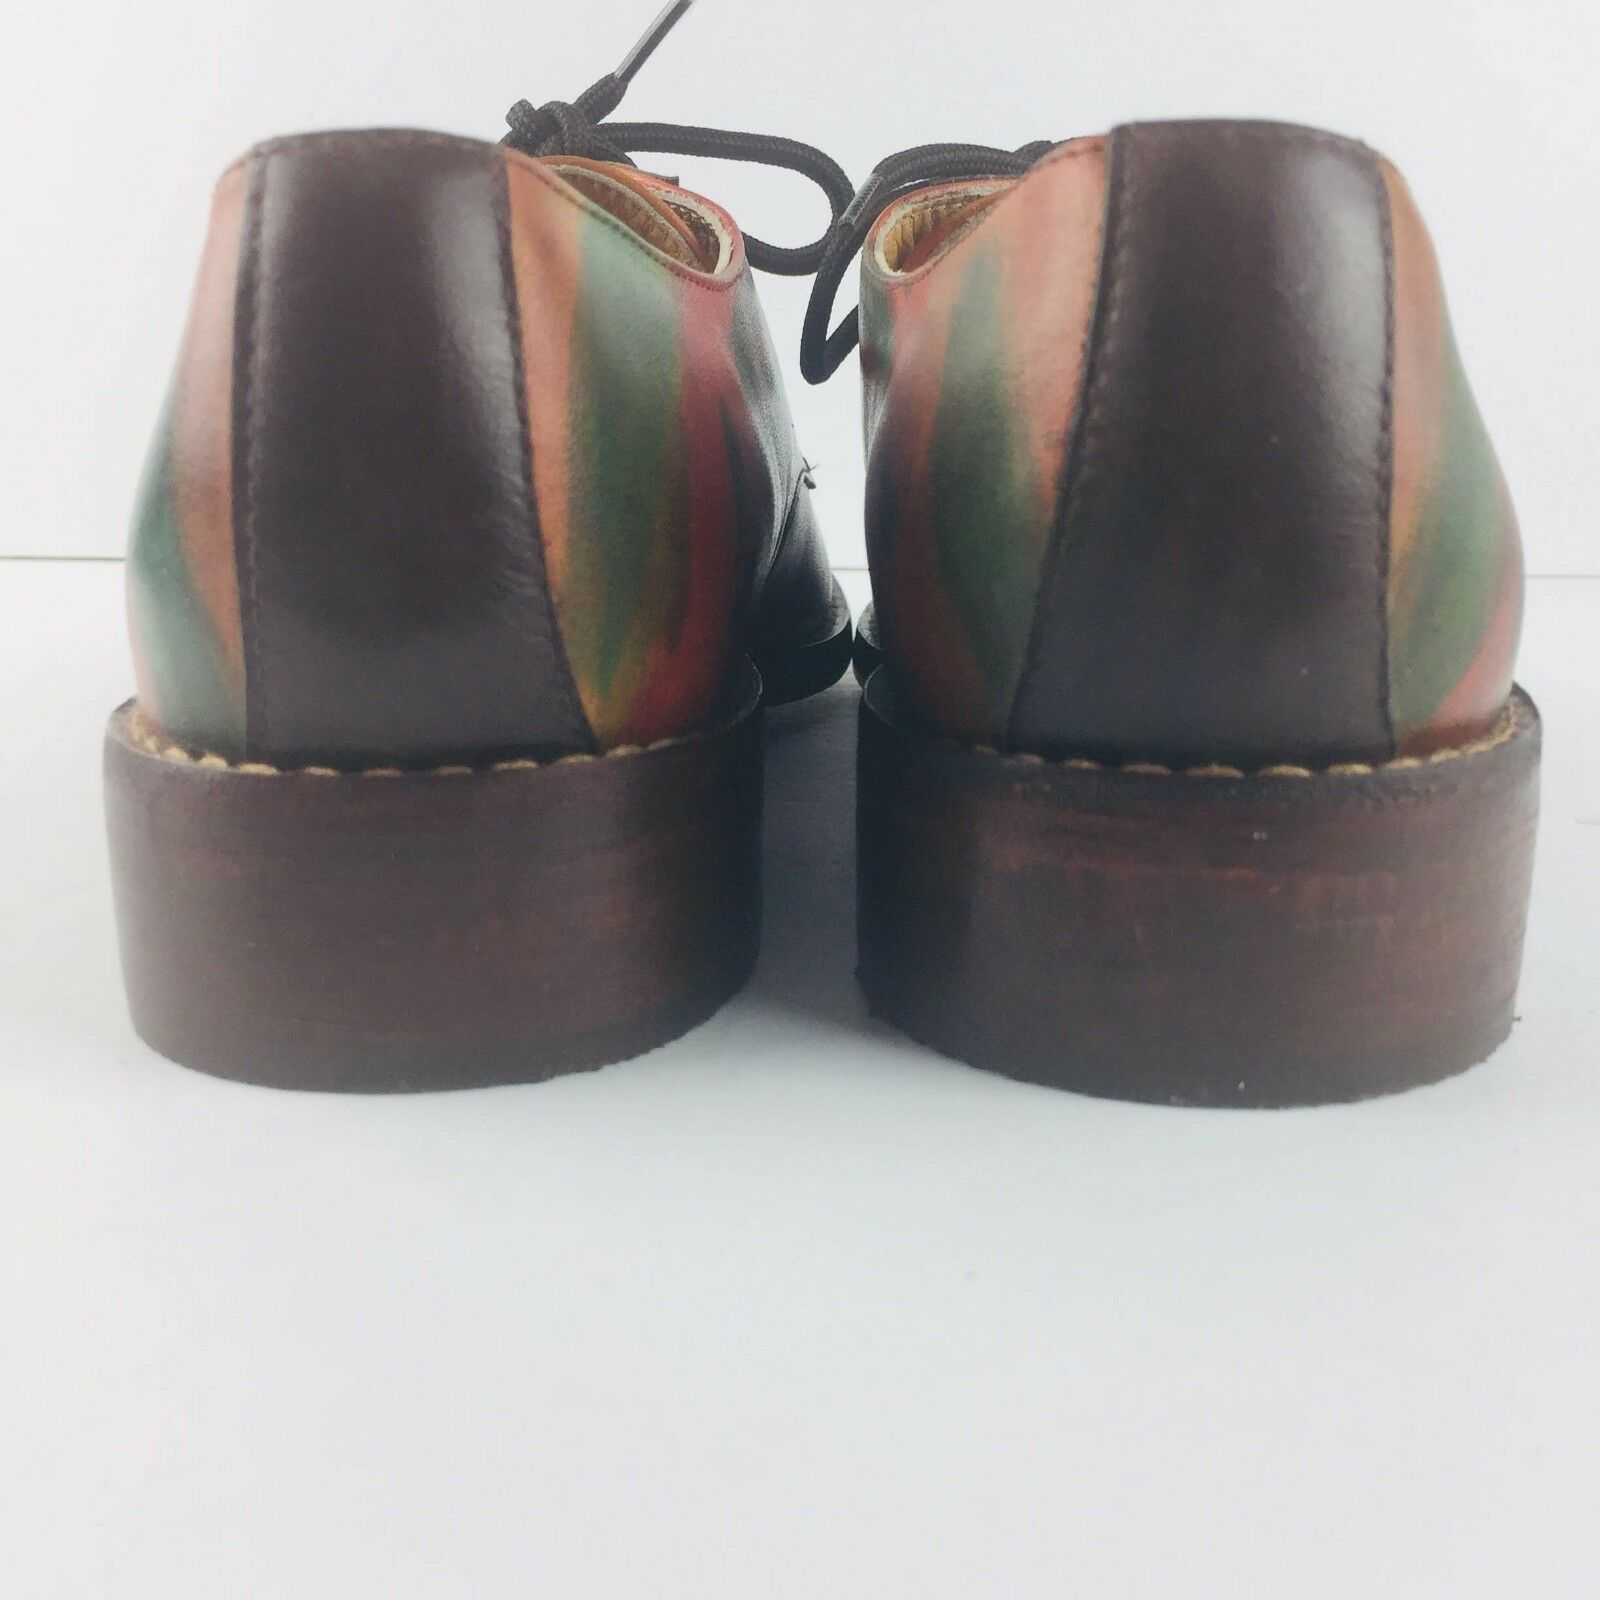 E Oxford Uomo Derby Uomo Oxford 39 Eur Pelle Wooden Heels Multi Color Rainbow 939d4b